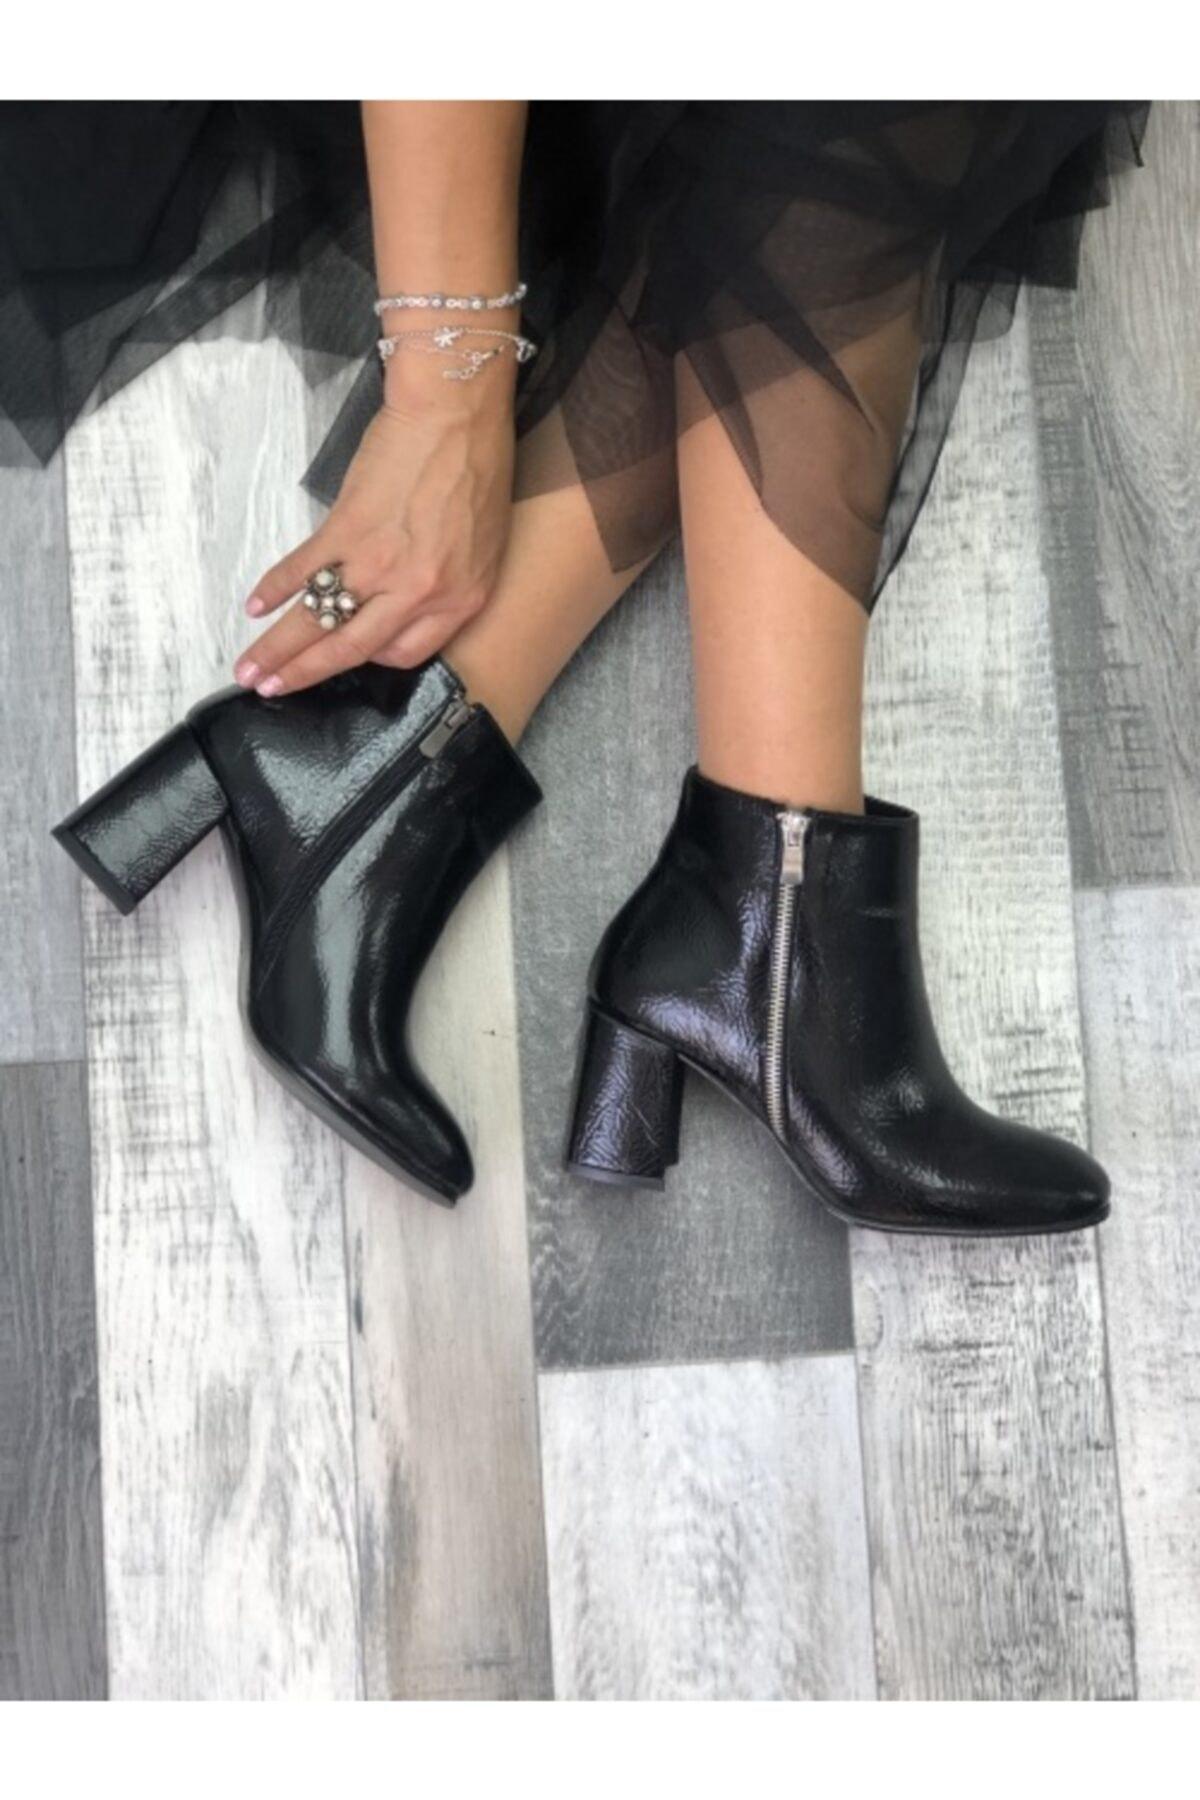 cerenstore Kadın Siyah Vera Kırışık Deri Topuklu Bot